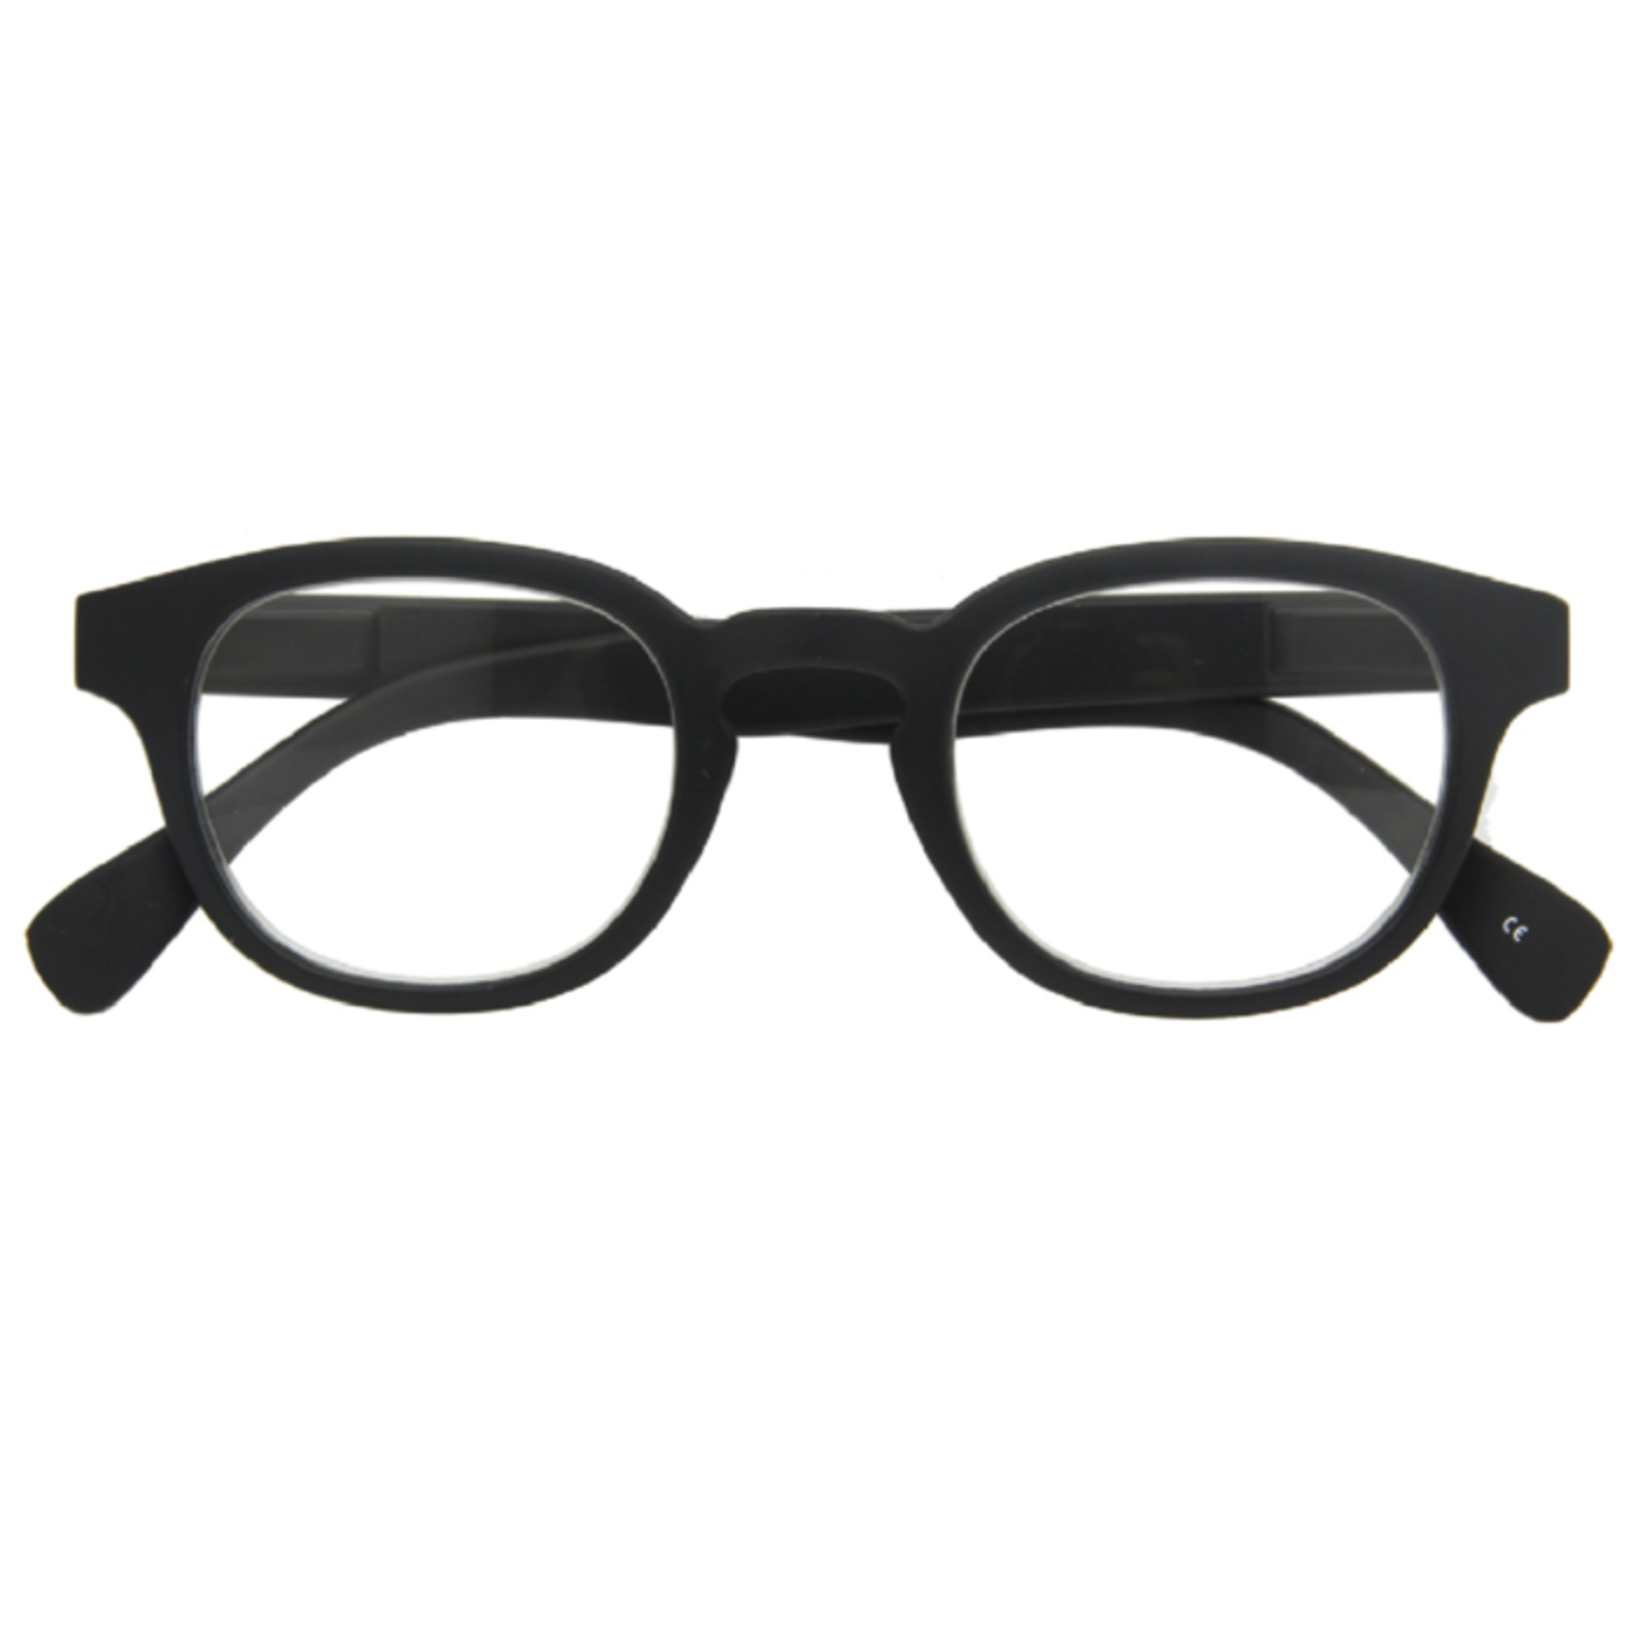 Croon Montel Matt Black leesbril